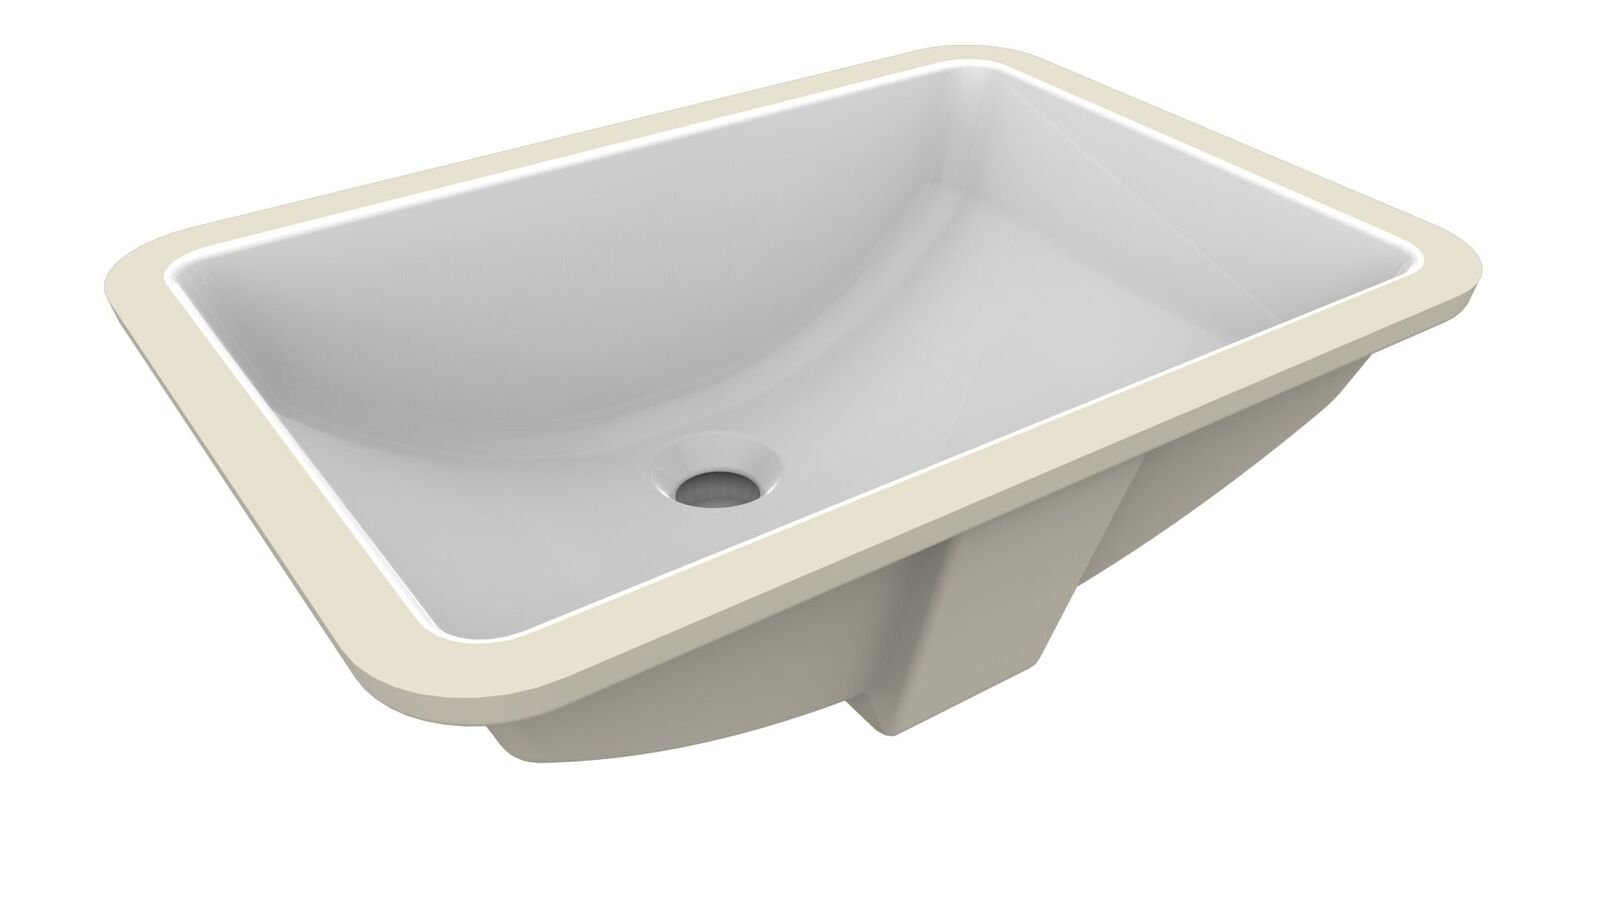 A&E Bath and Shower Nevine Fusion Undermount Ceramic Basin, White by A&E Bath and Shower